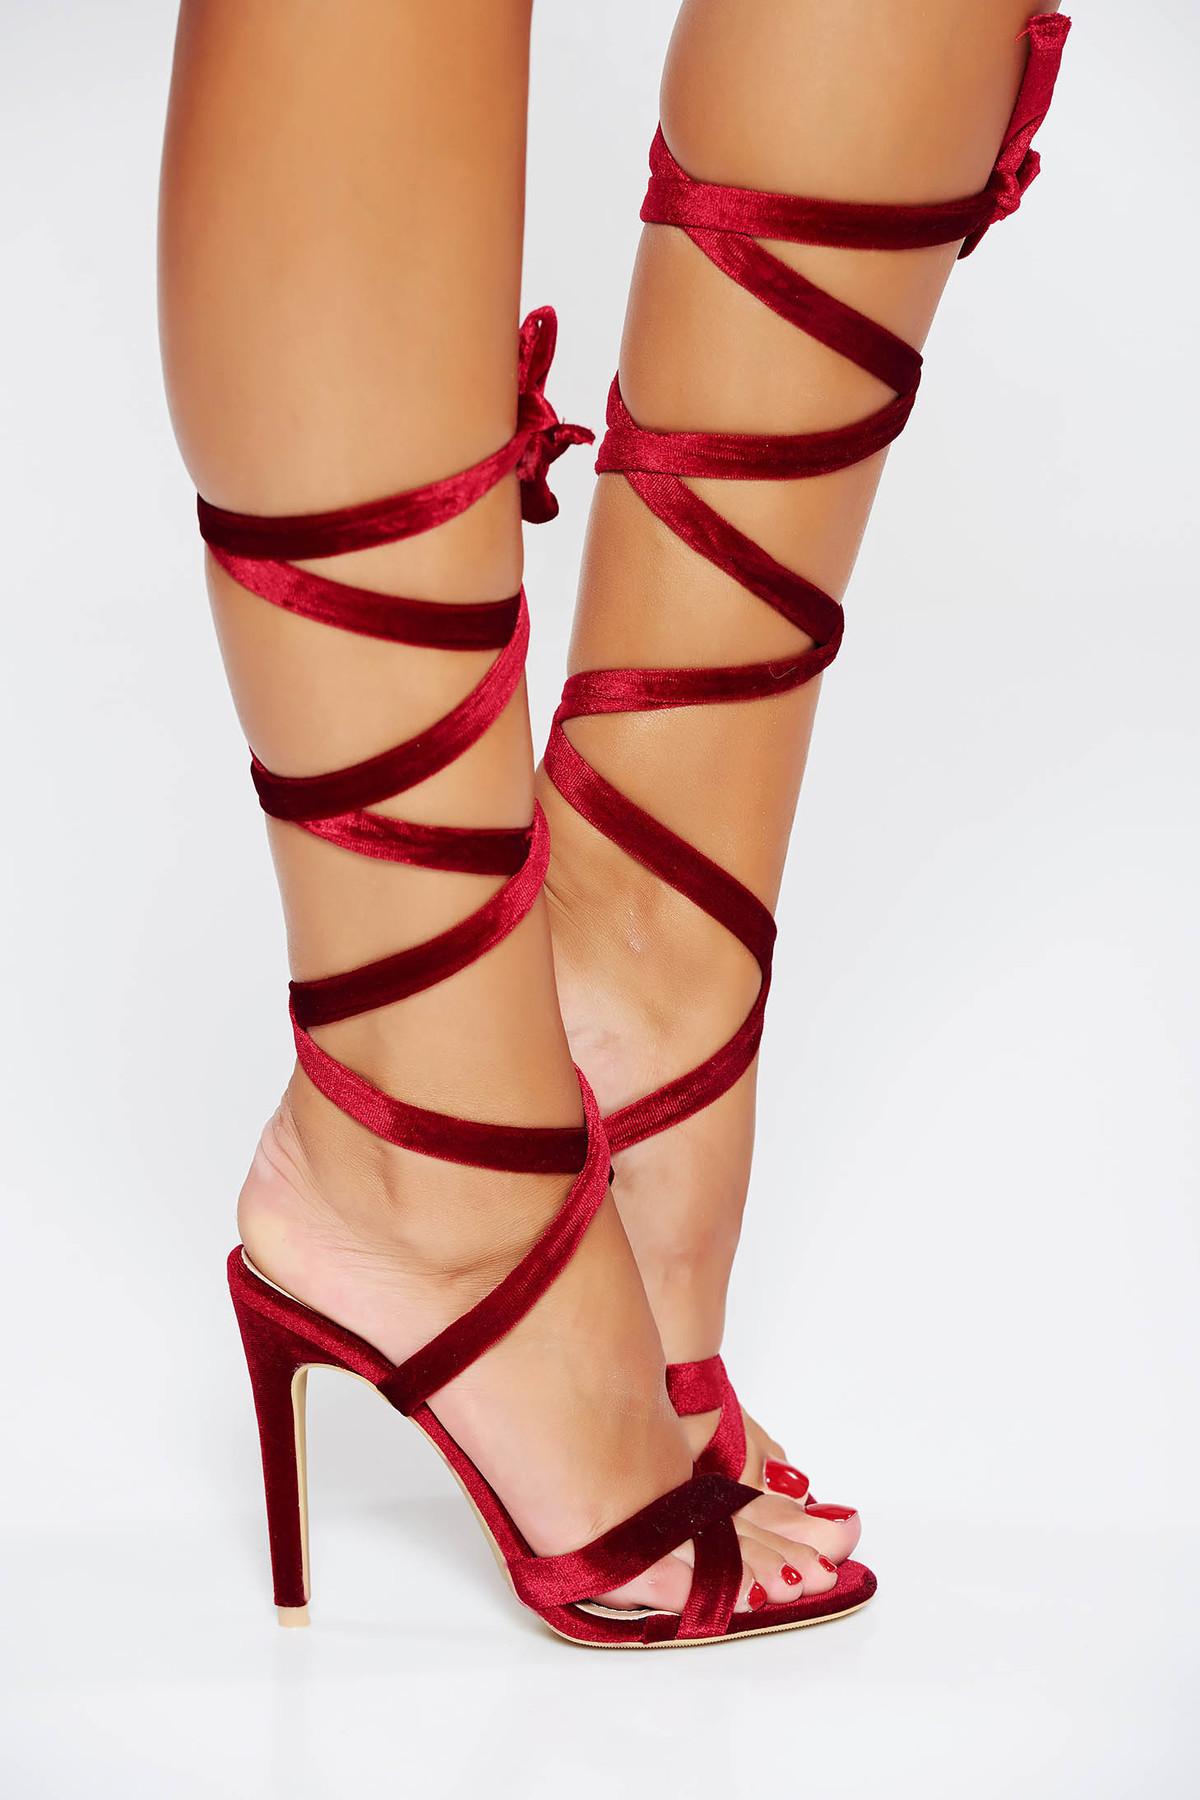 Sandale rosii de ocazie cu barete subtiri